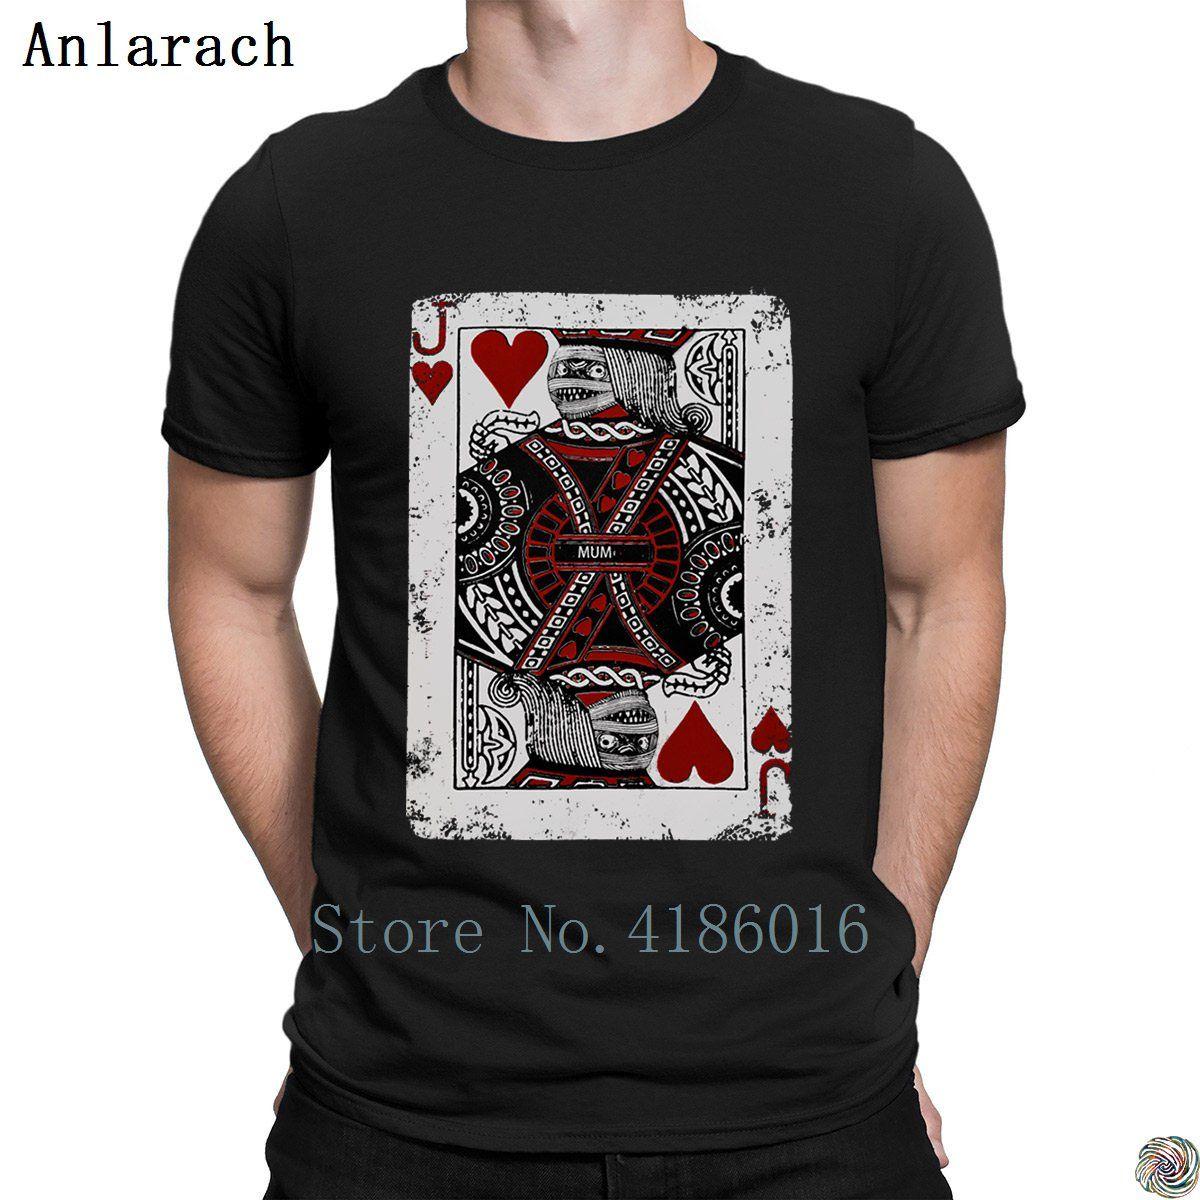 Joker Mamat-shirts Rundhalsausschnitt Vintage-Designing Sommermänner T-Shirt Kleidung HipHop neuer Anlarach Tops ausgestattet